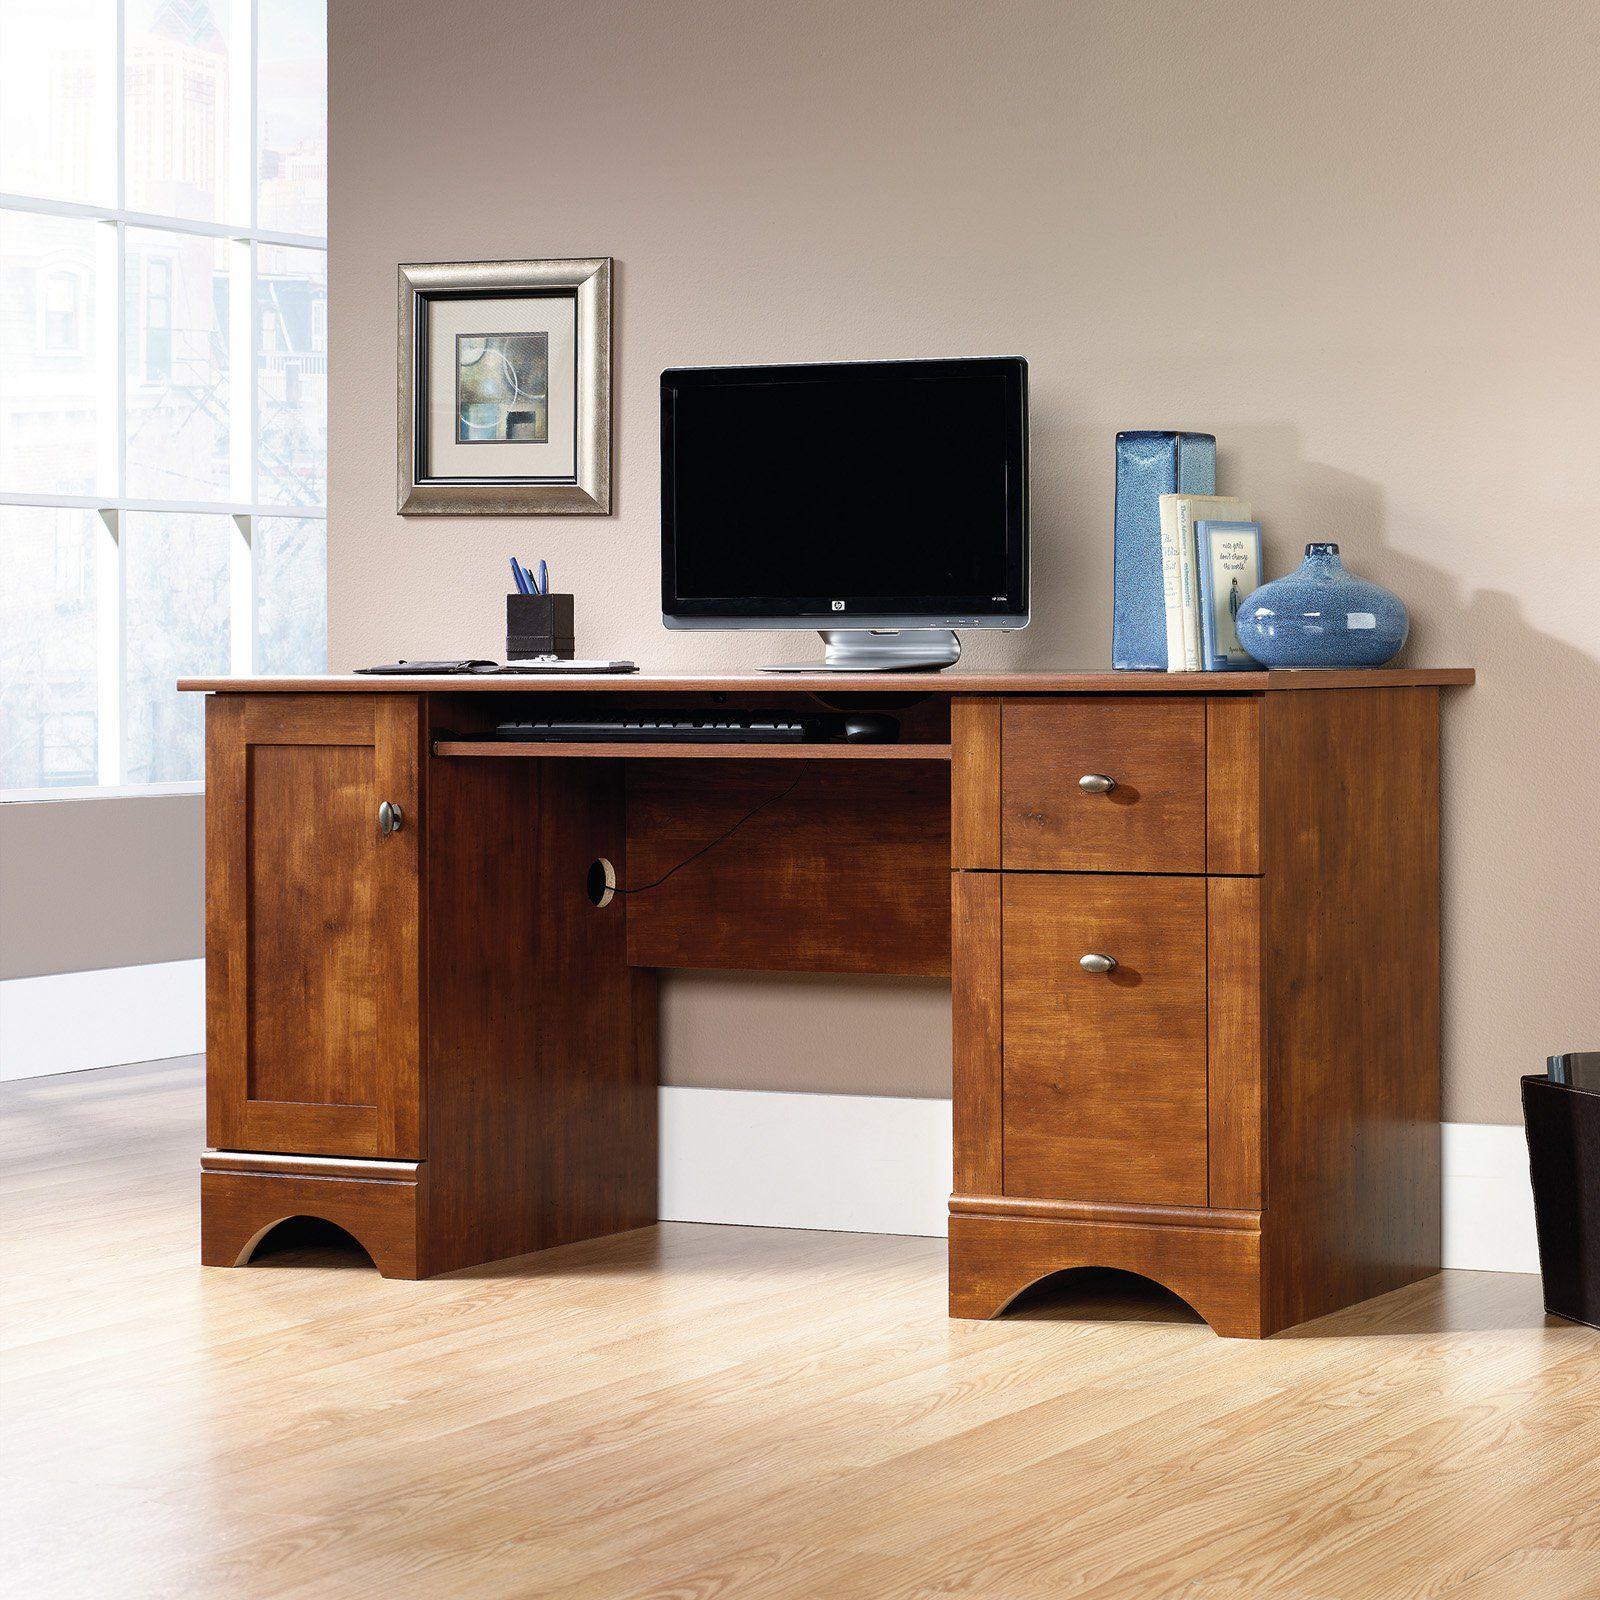 Sauder Select Computer Desk The Sauder